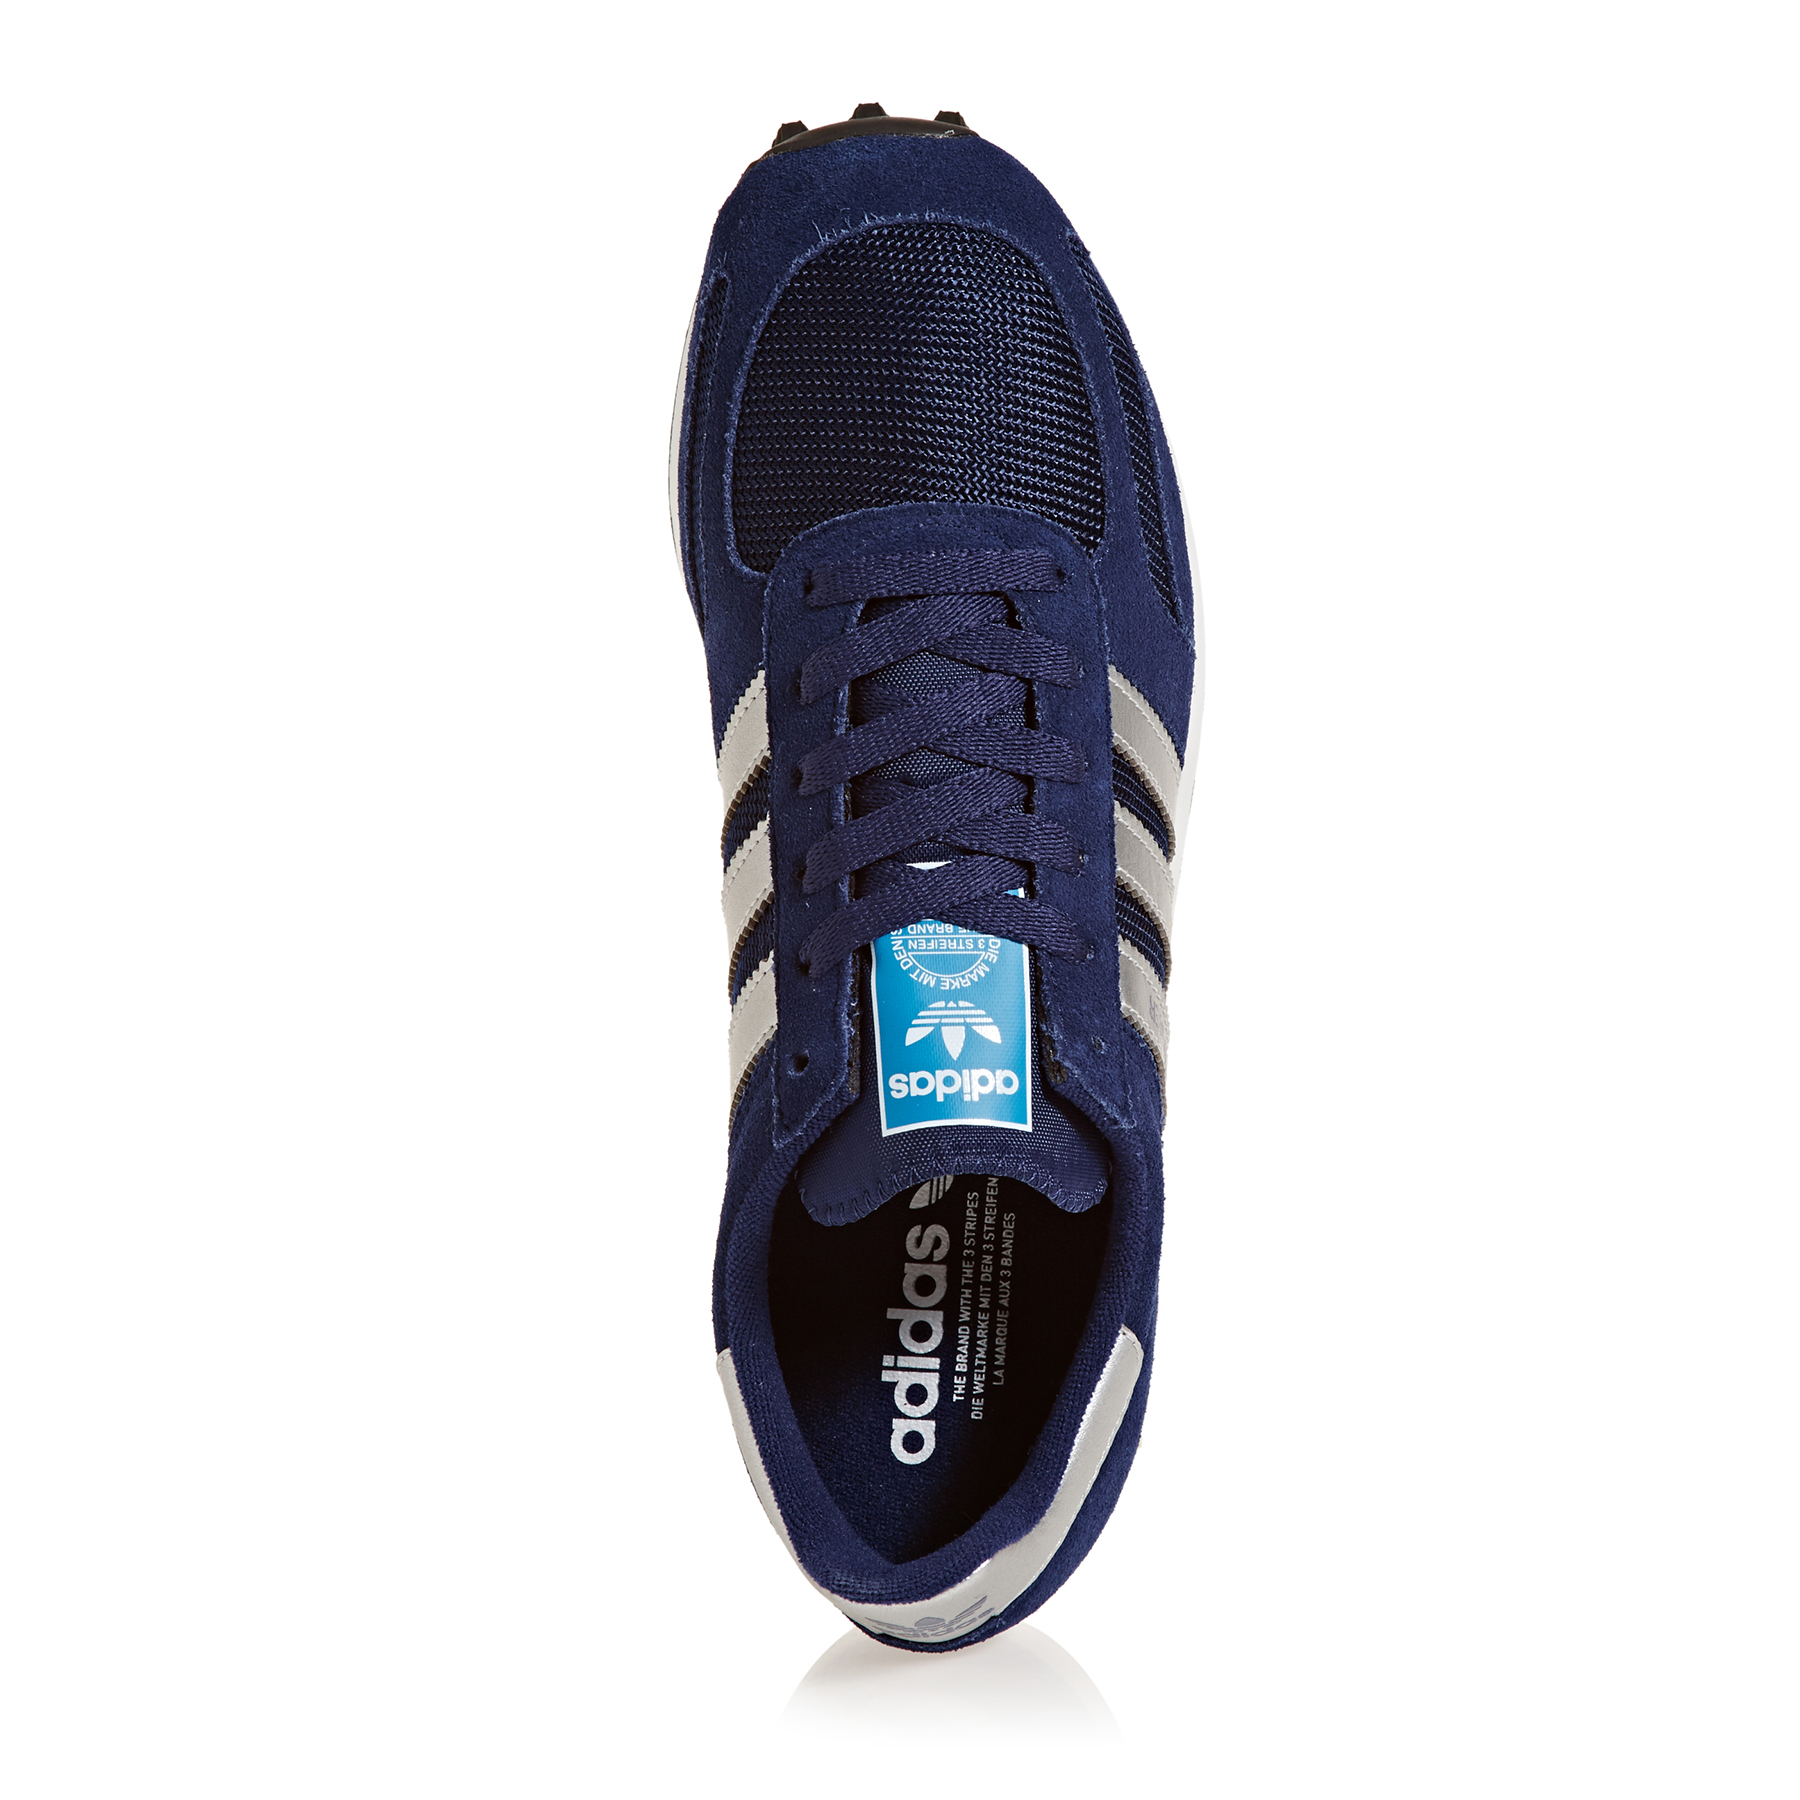 Comprar Sapatos Homem Online Adidas Originals LA Trainer